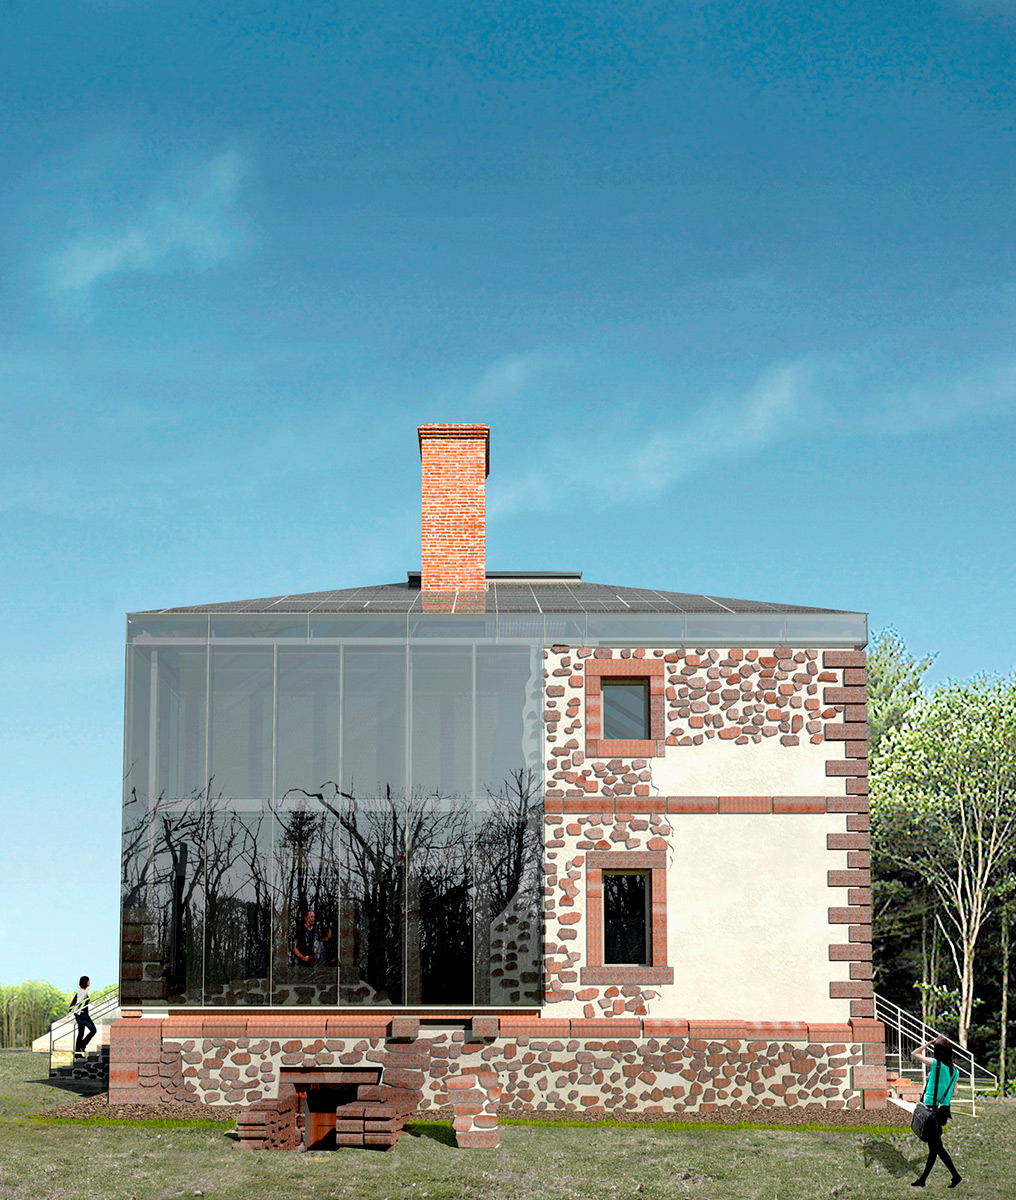 The-Glass-House-Project-Menokin-Machado-Silvetti-05